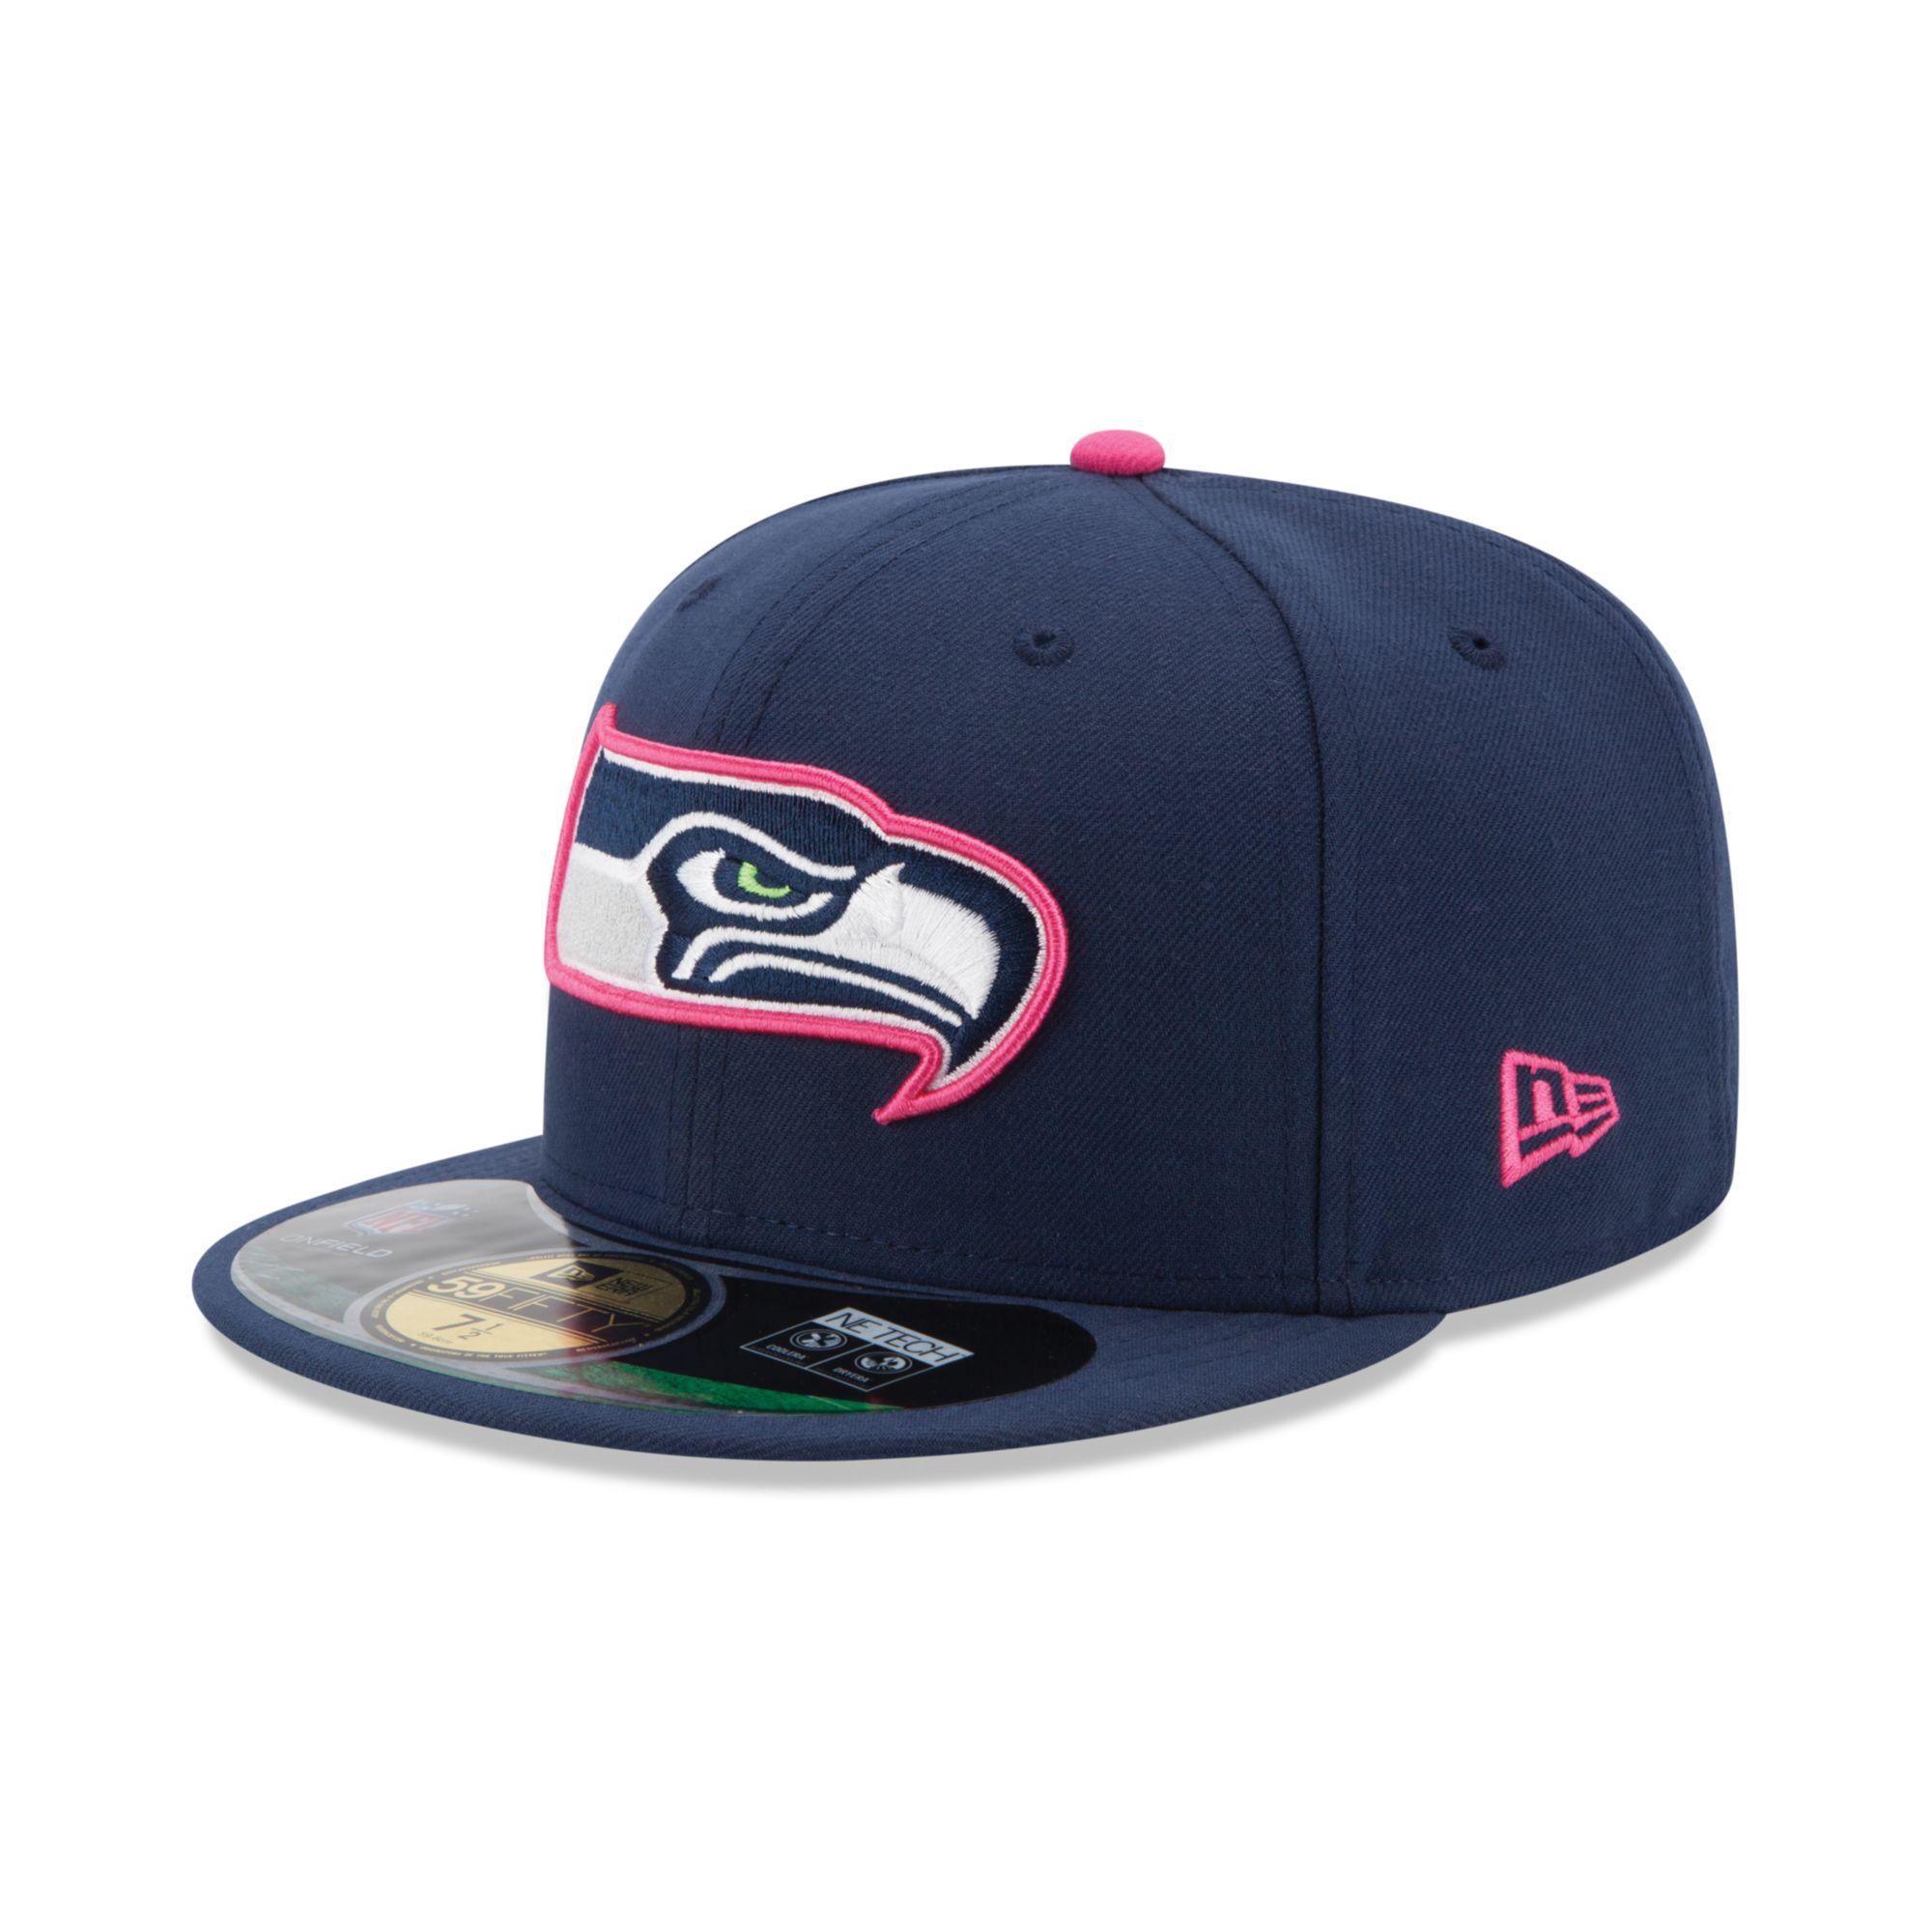 f77db946f36 Lyst - KTZ Seattle Seahawks Breast Cancer Awareness 59fifty Cap in ...